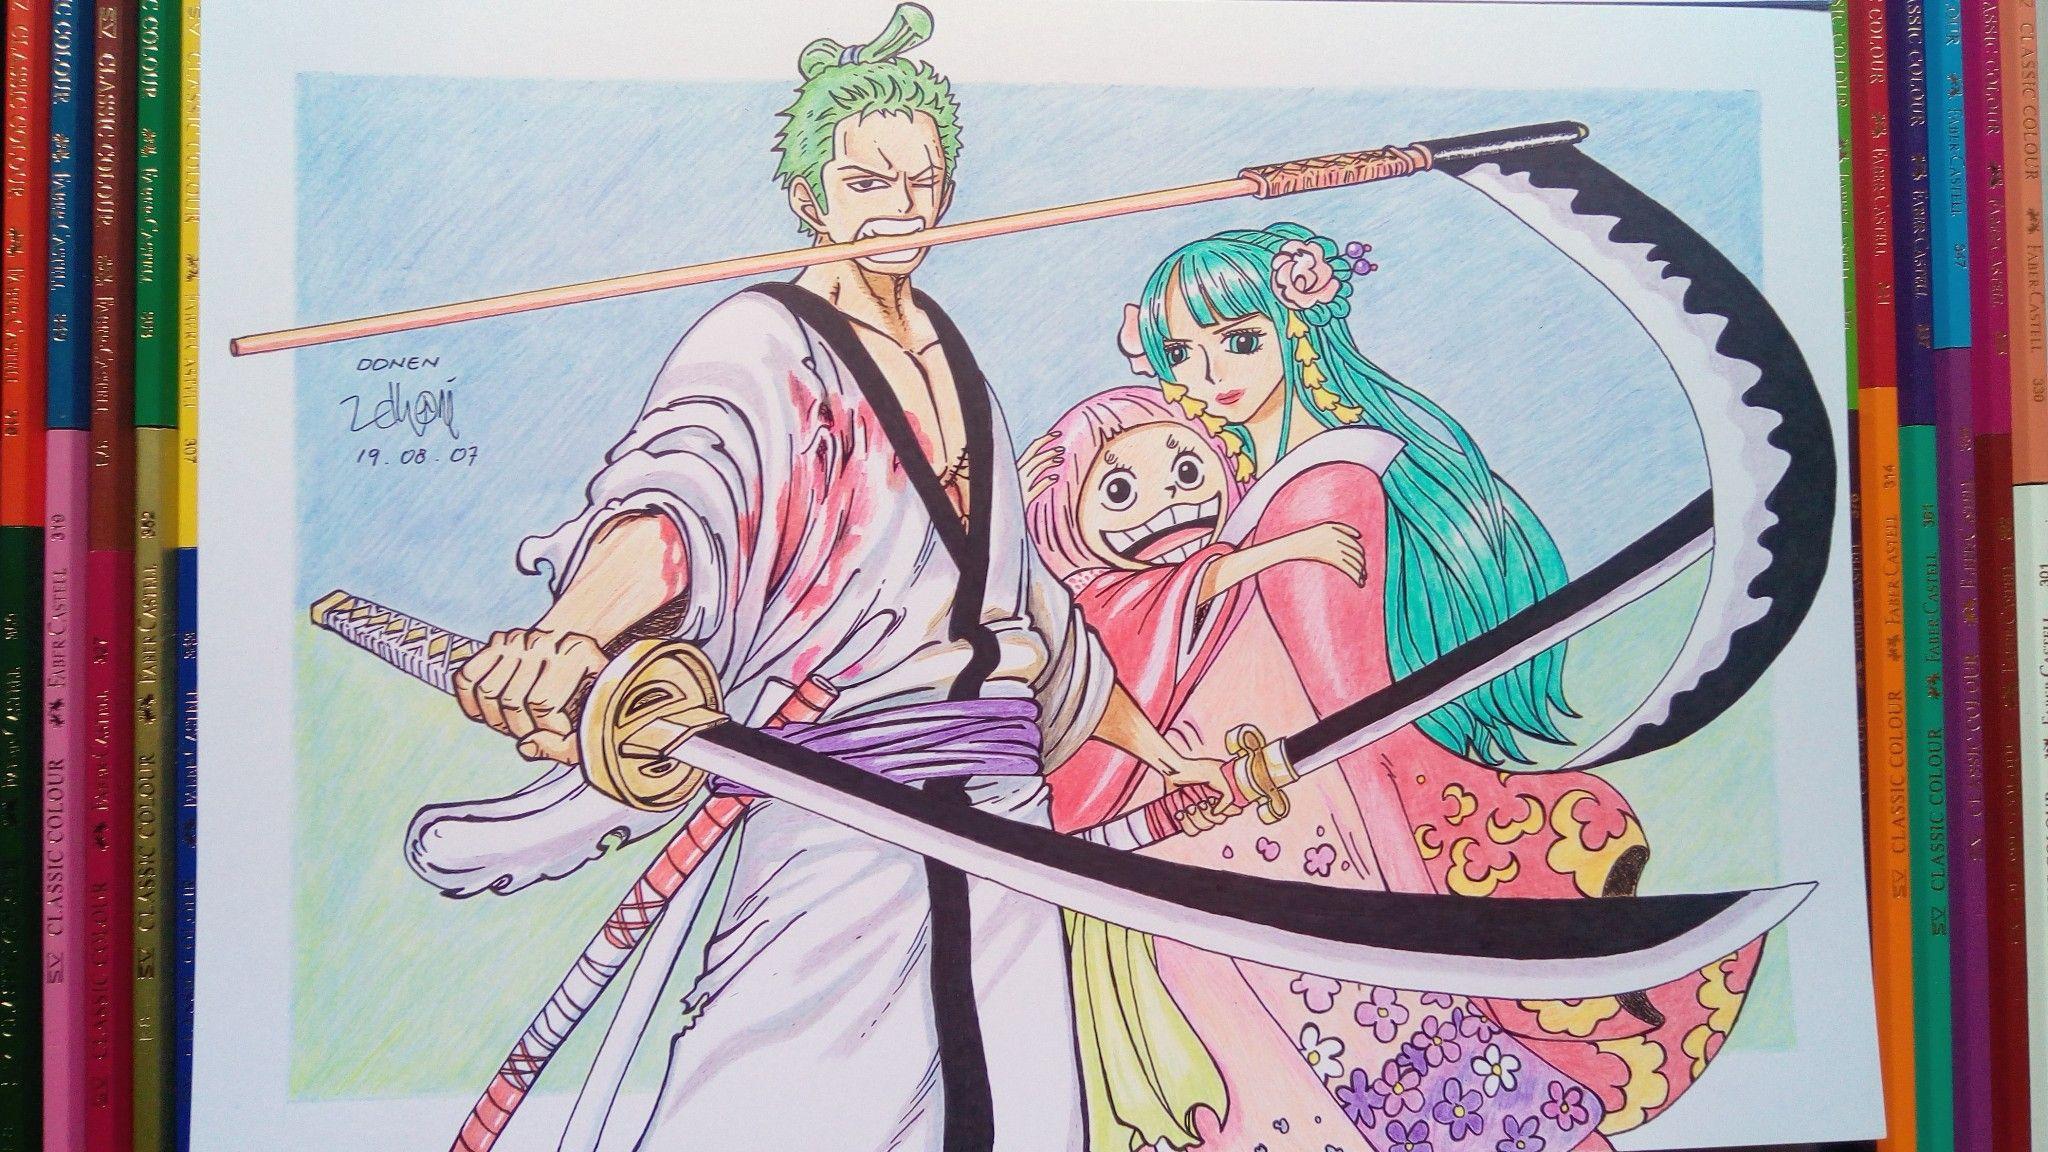 Zoro & Hiyori | Zoro, One piece fanart, Anime fanart